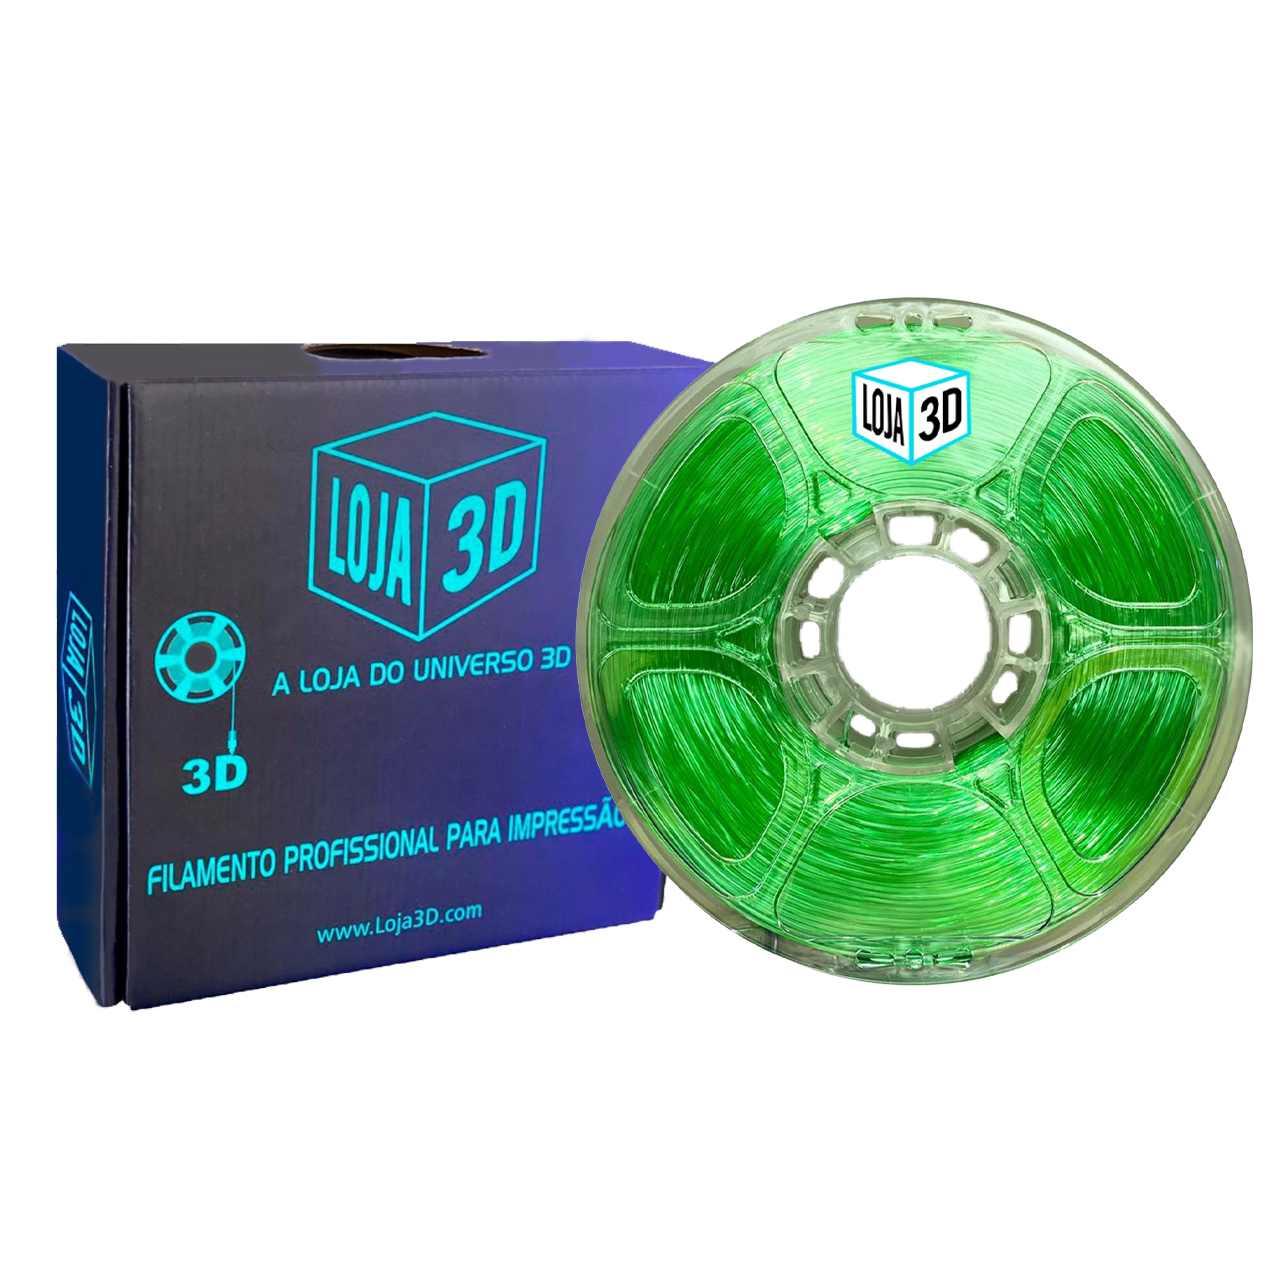 Filamento Flex TPU Premium - Verde Mato - Loja 3D - 1.75mm - 1kg